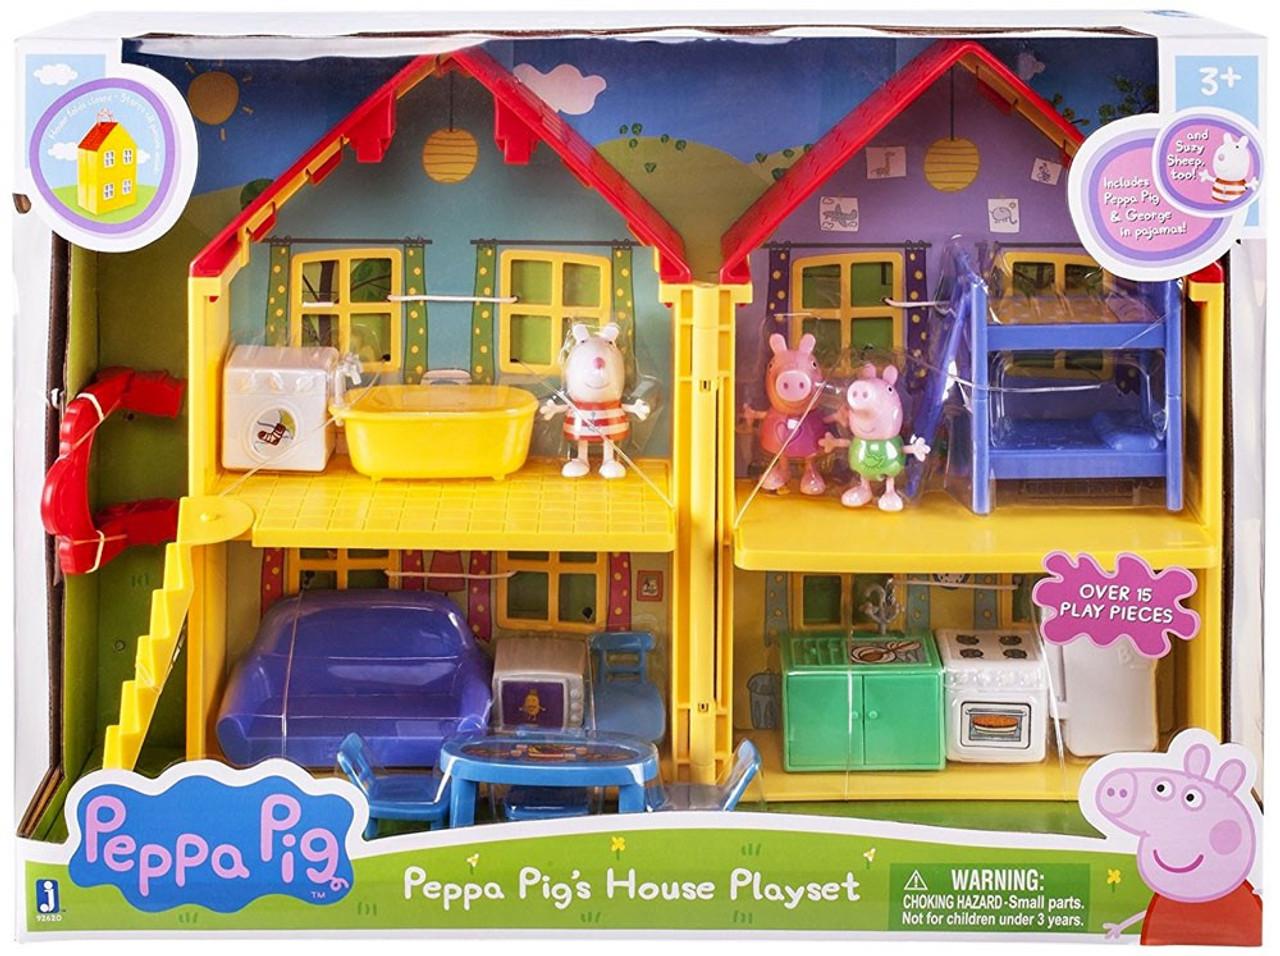 Peppa Pig S House Playset